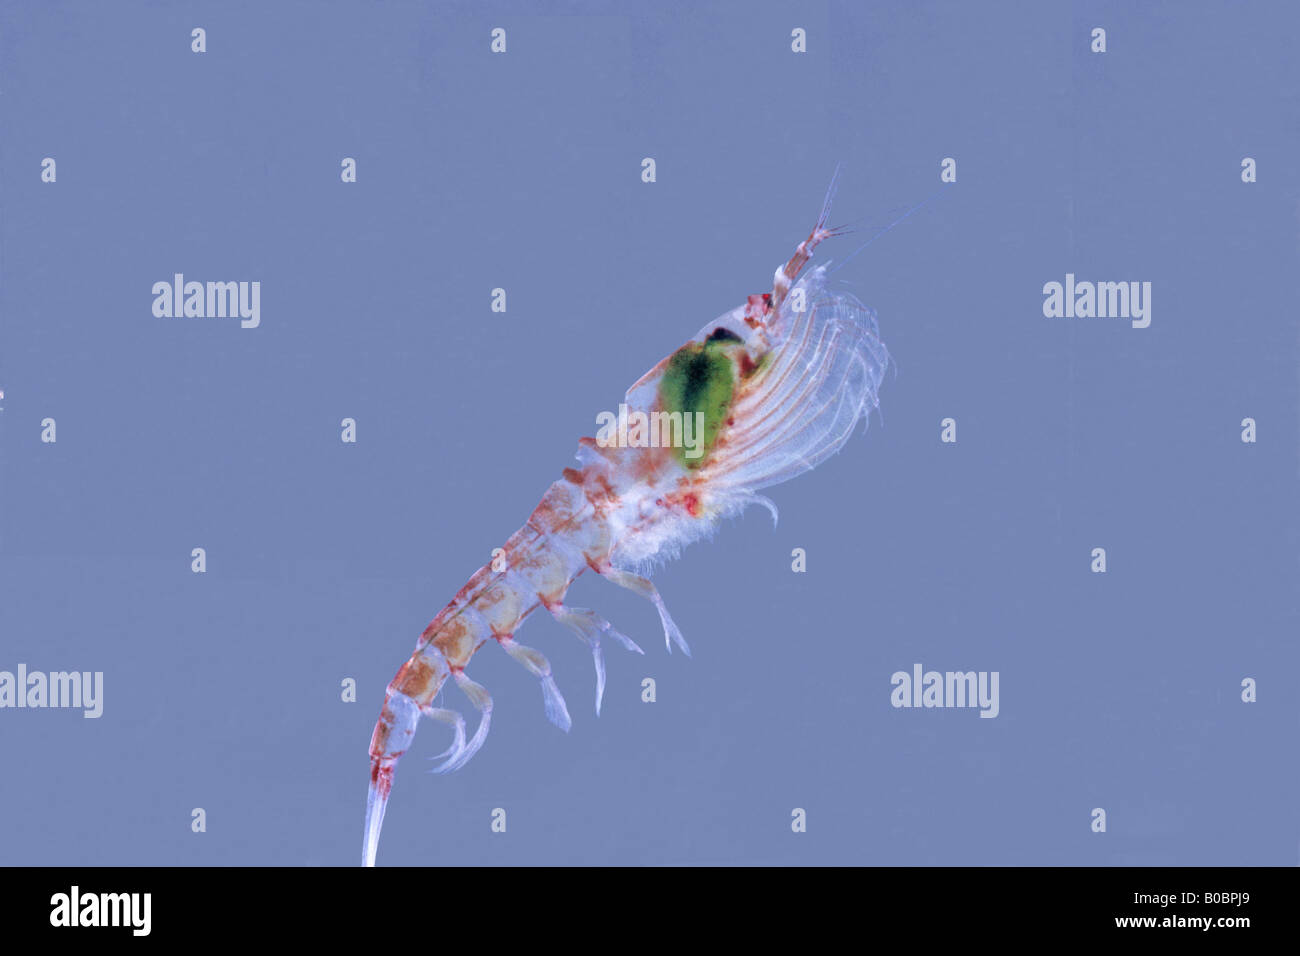 Giant Antarctic Amphipod (Eusirus sp.), up to 4 cm long - Stock Image